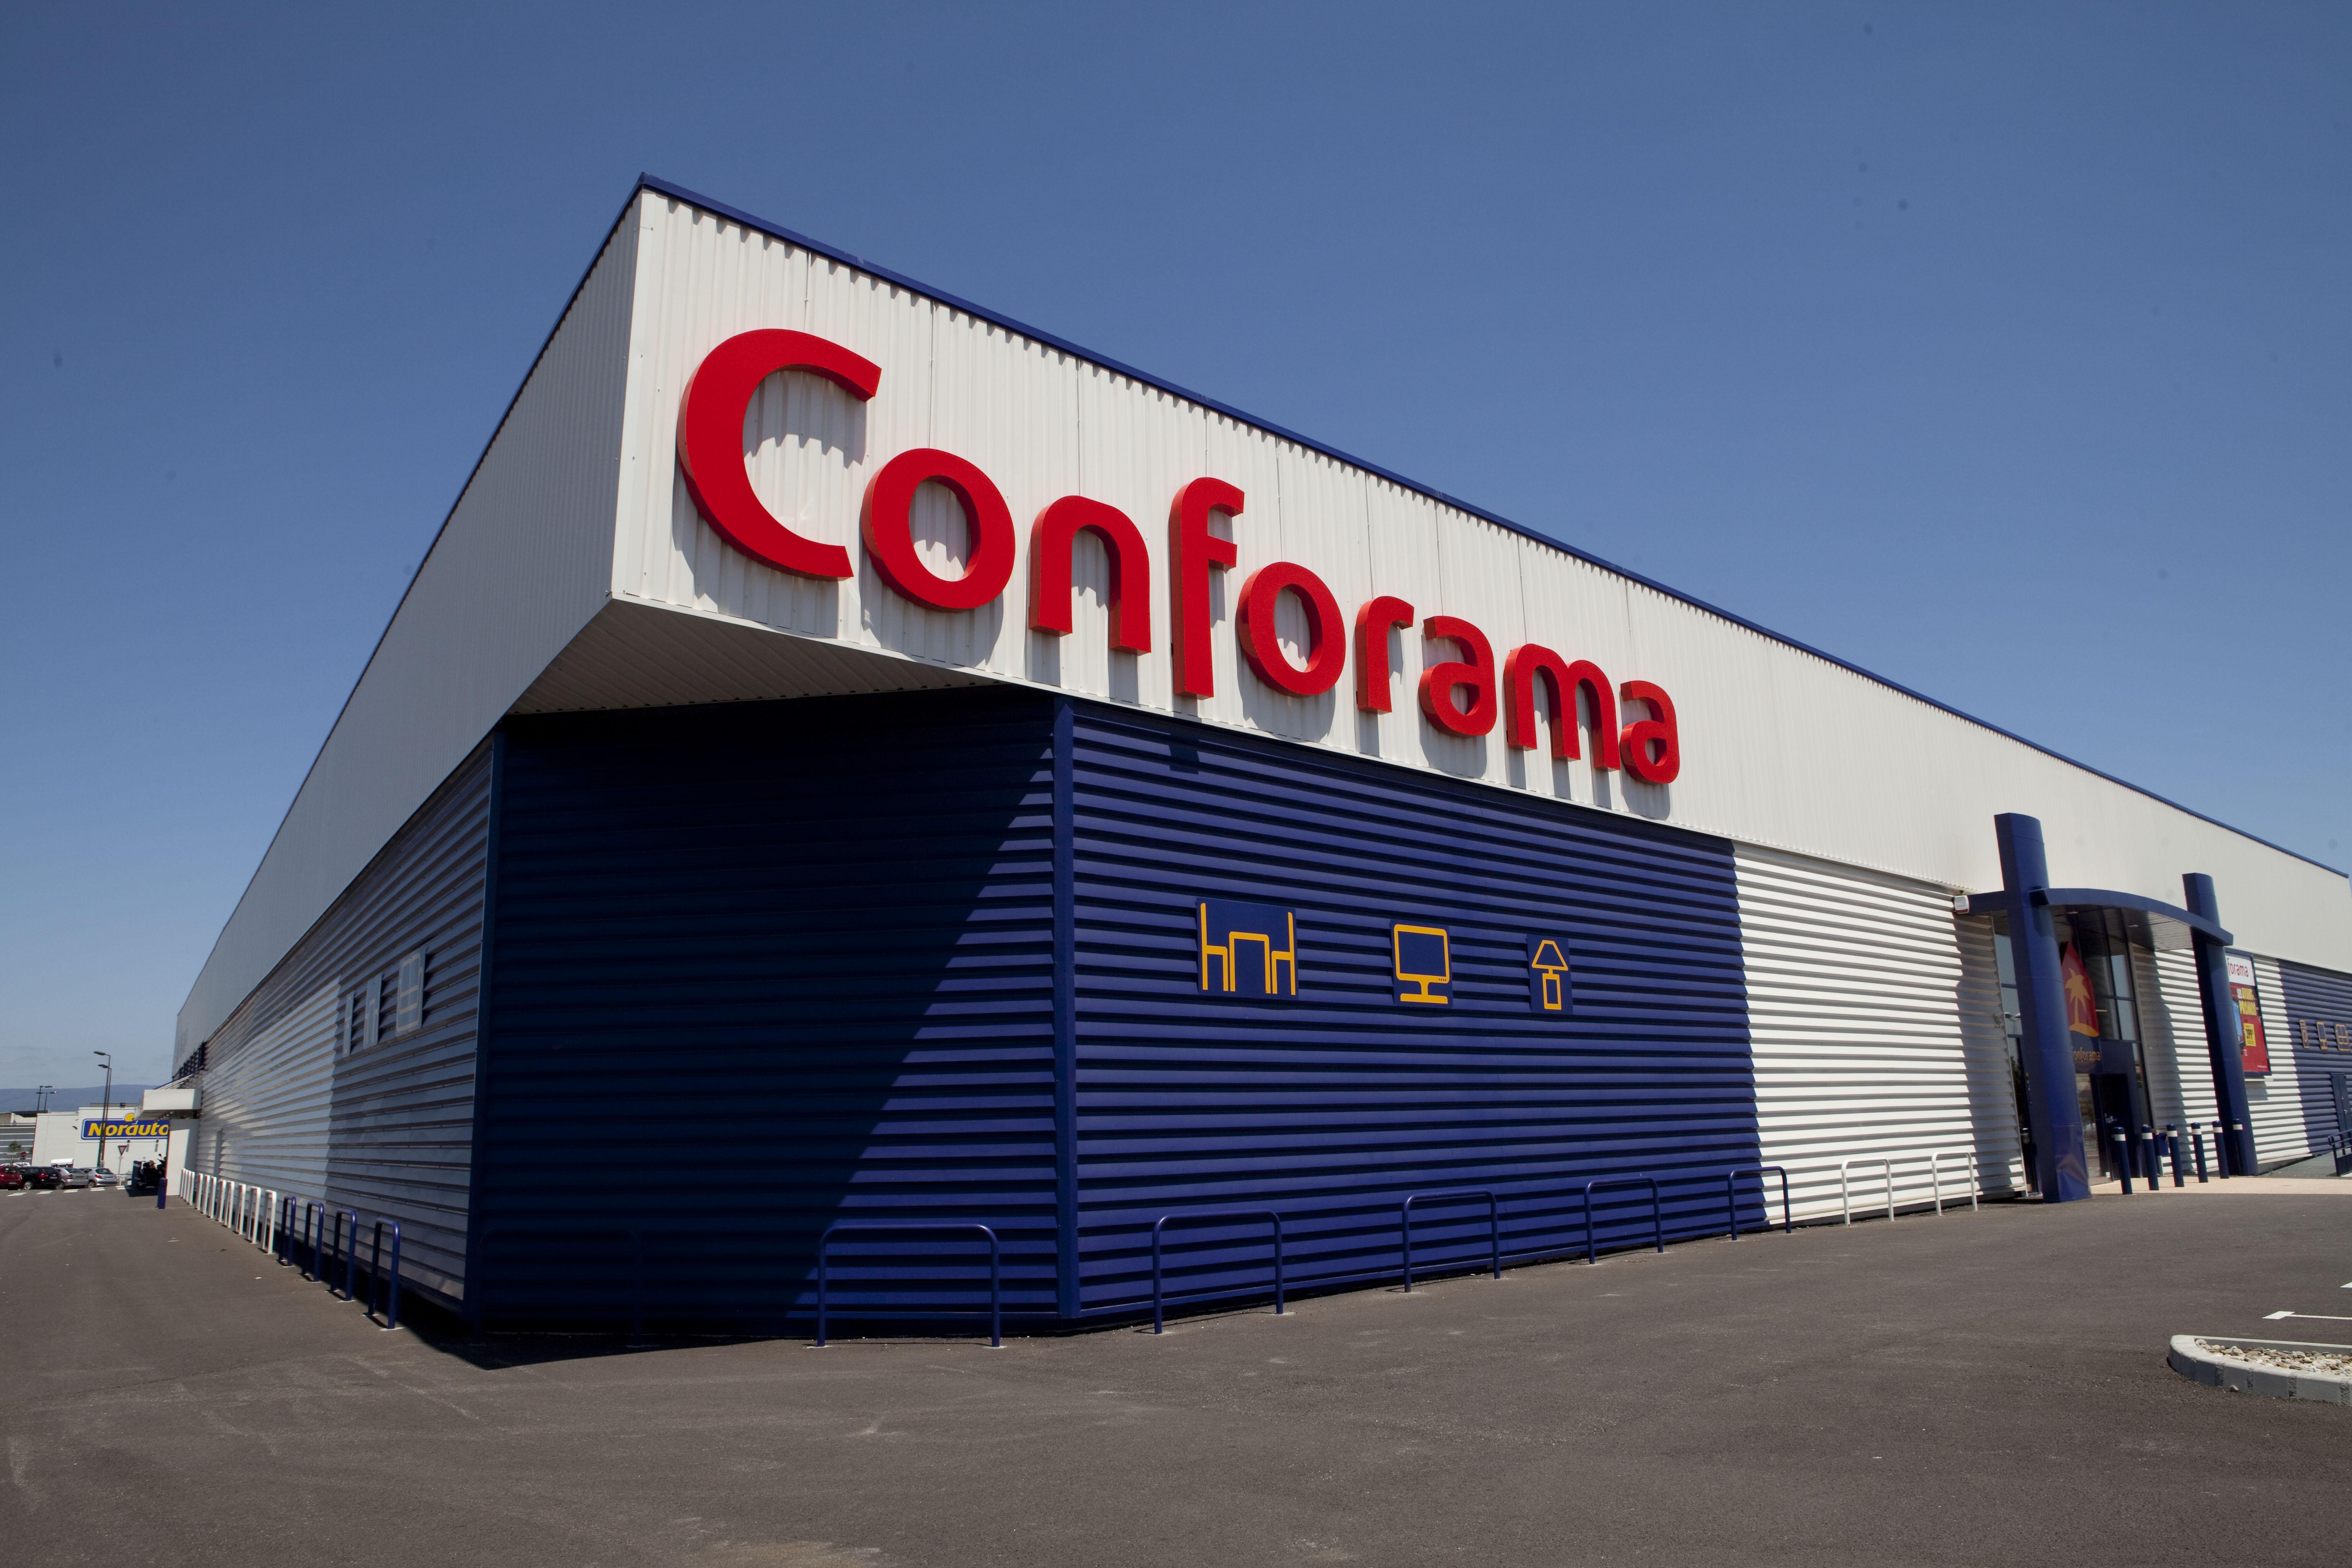 Conforama France